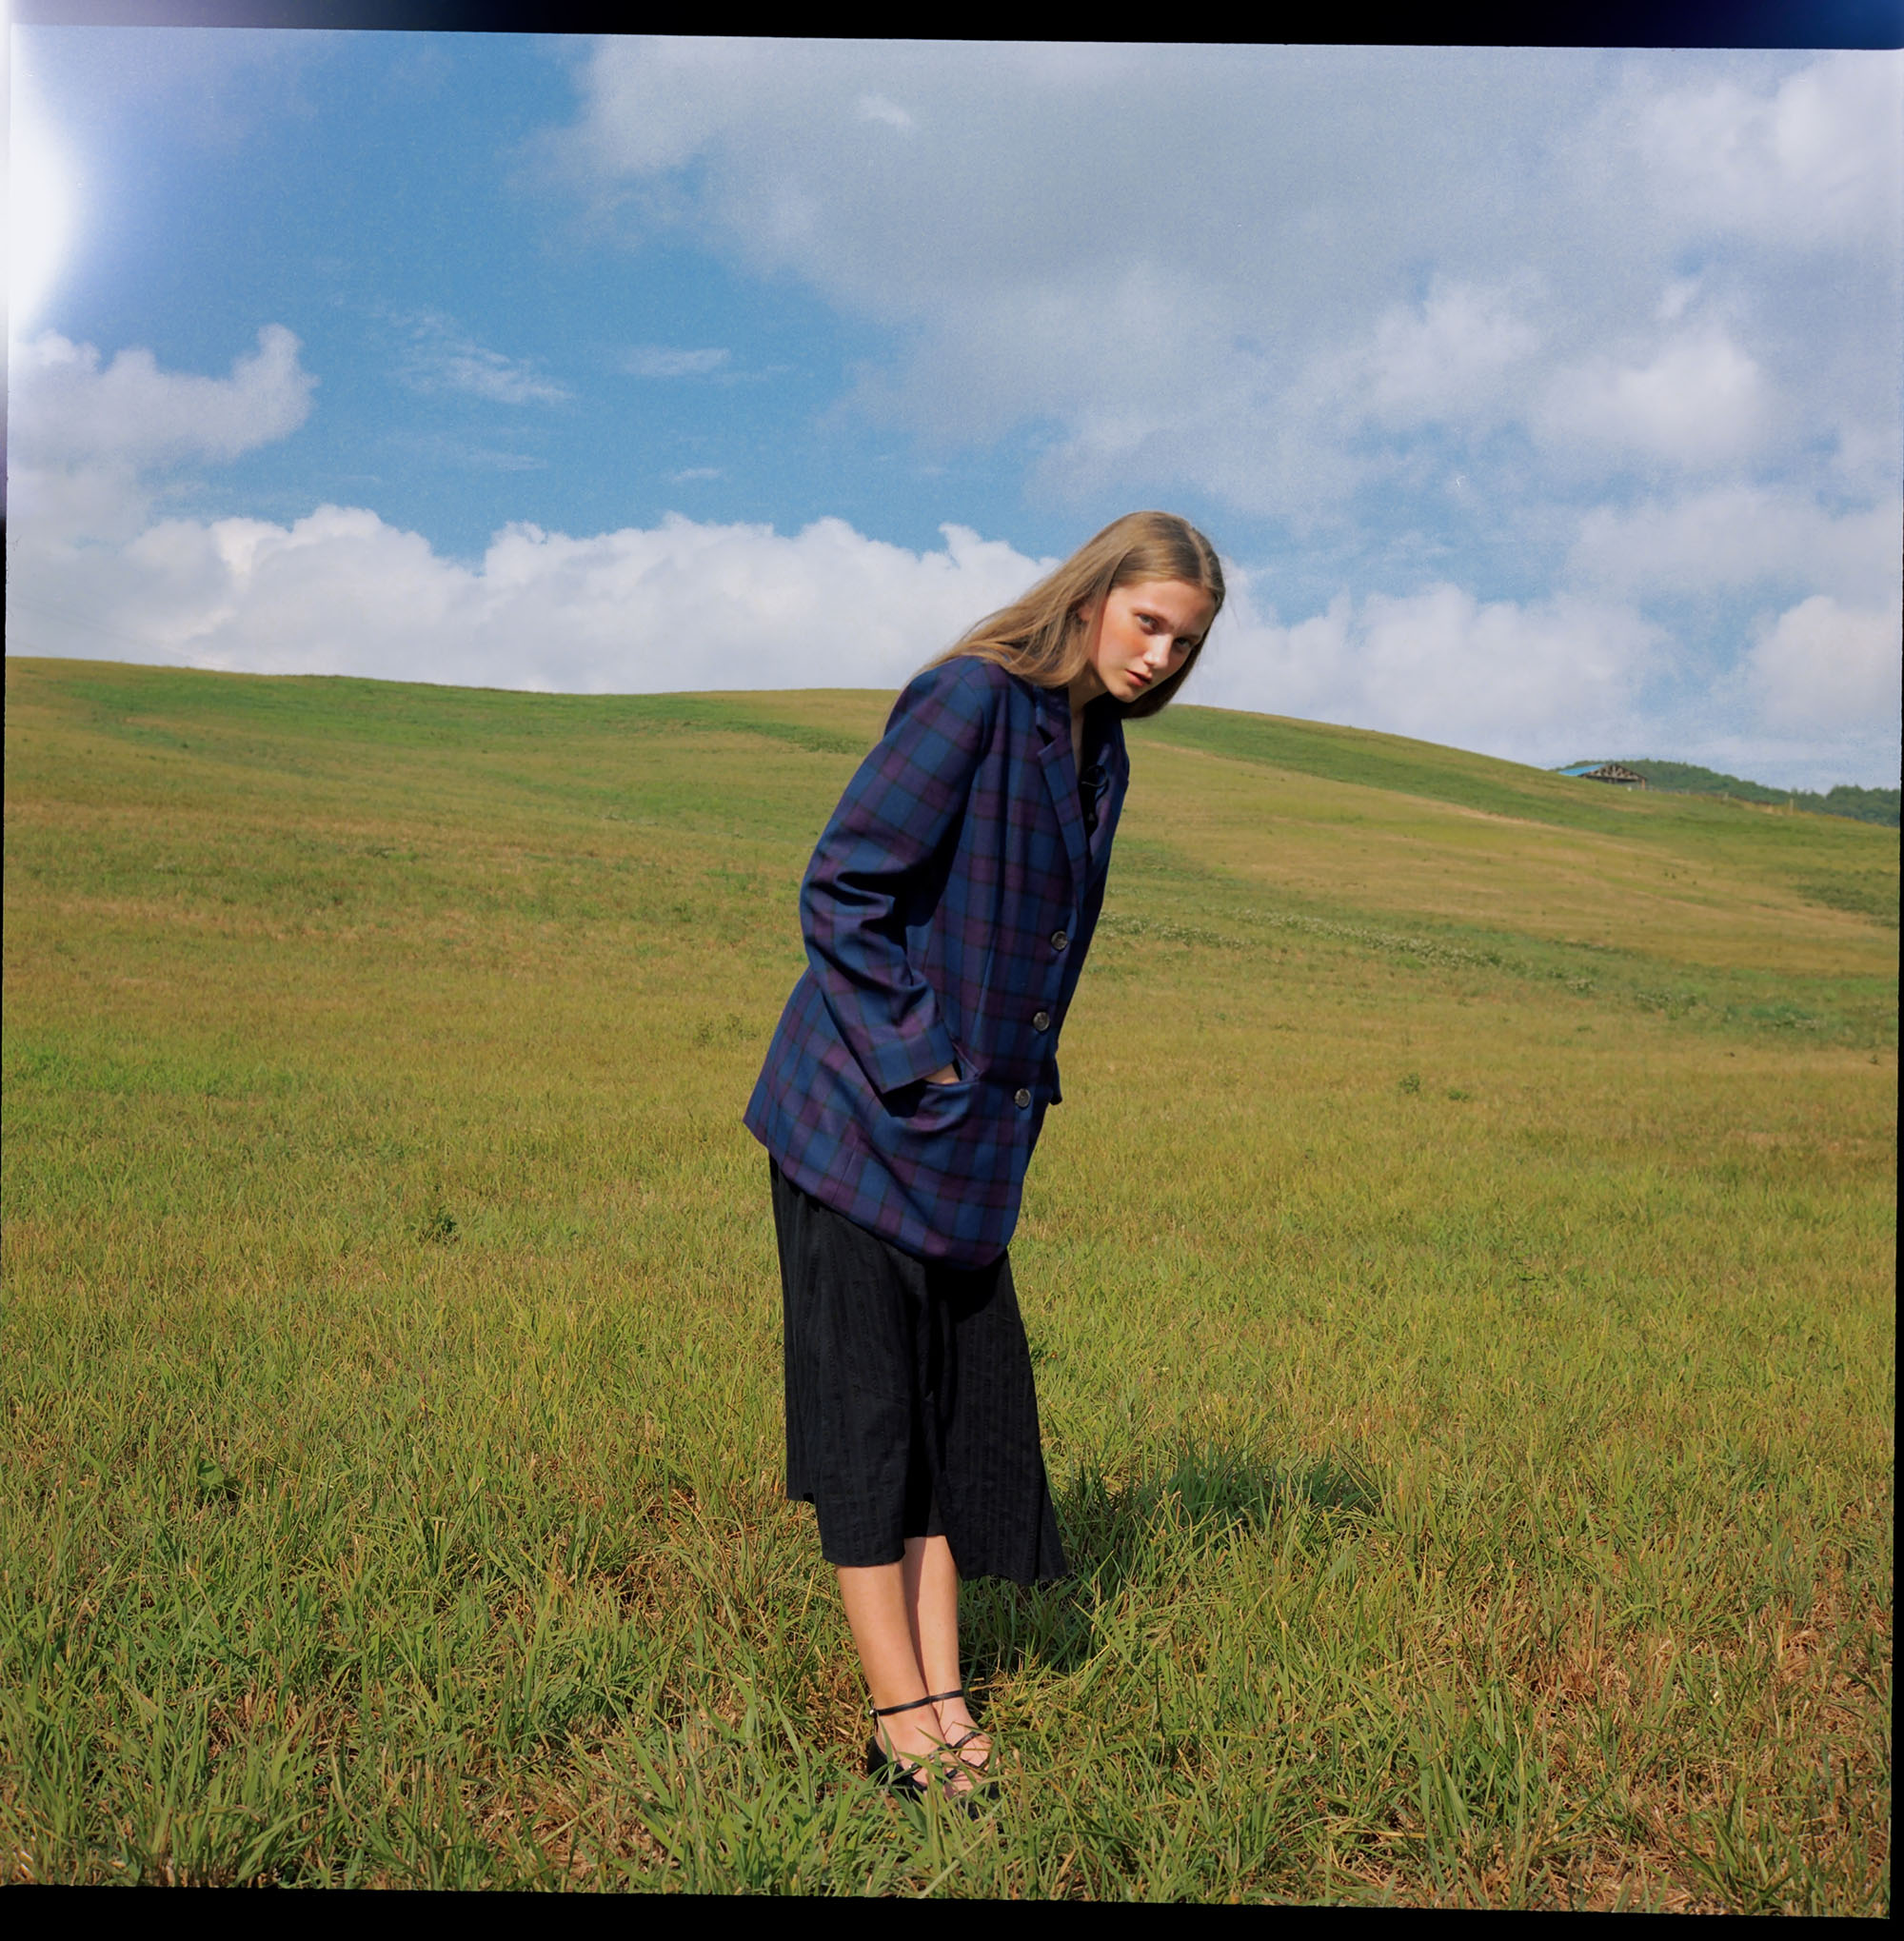 Photography  Joanna Legid  Talents  Dinah  Styling & Production  Anna Baur  MUA  Victoria Reuter  shot for the GIRLBOSS issue of  Blonde Magazine